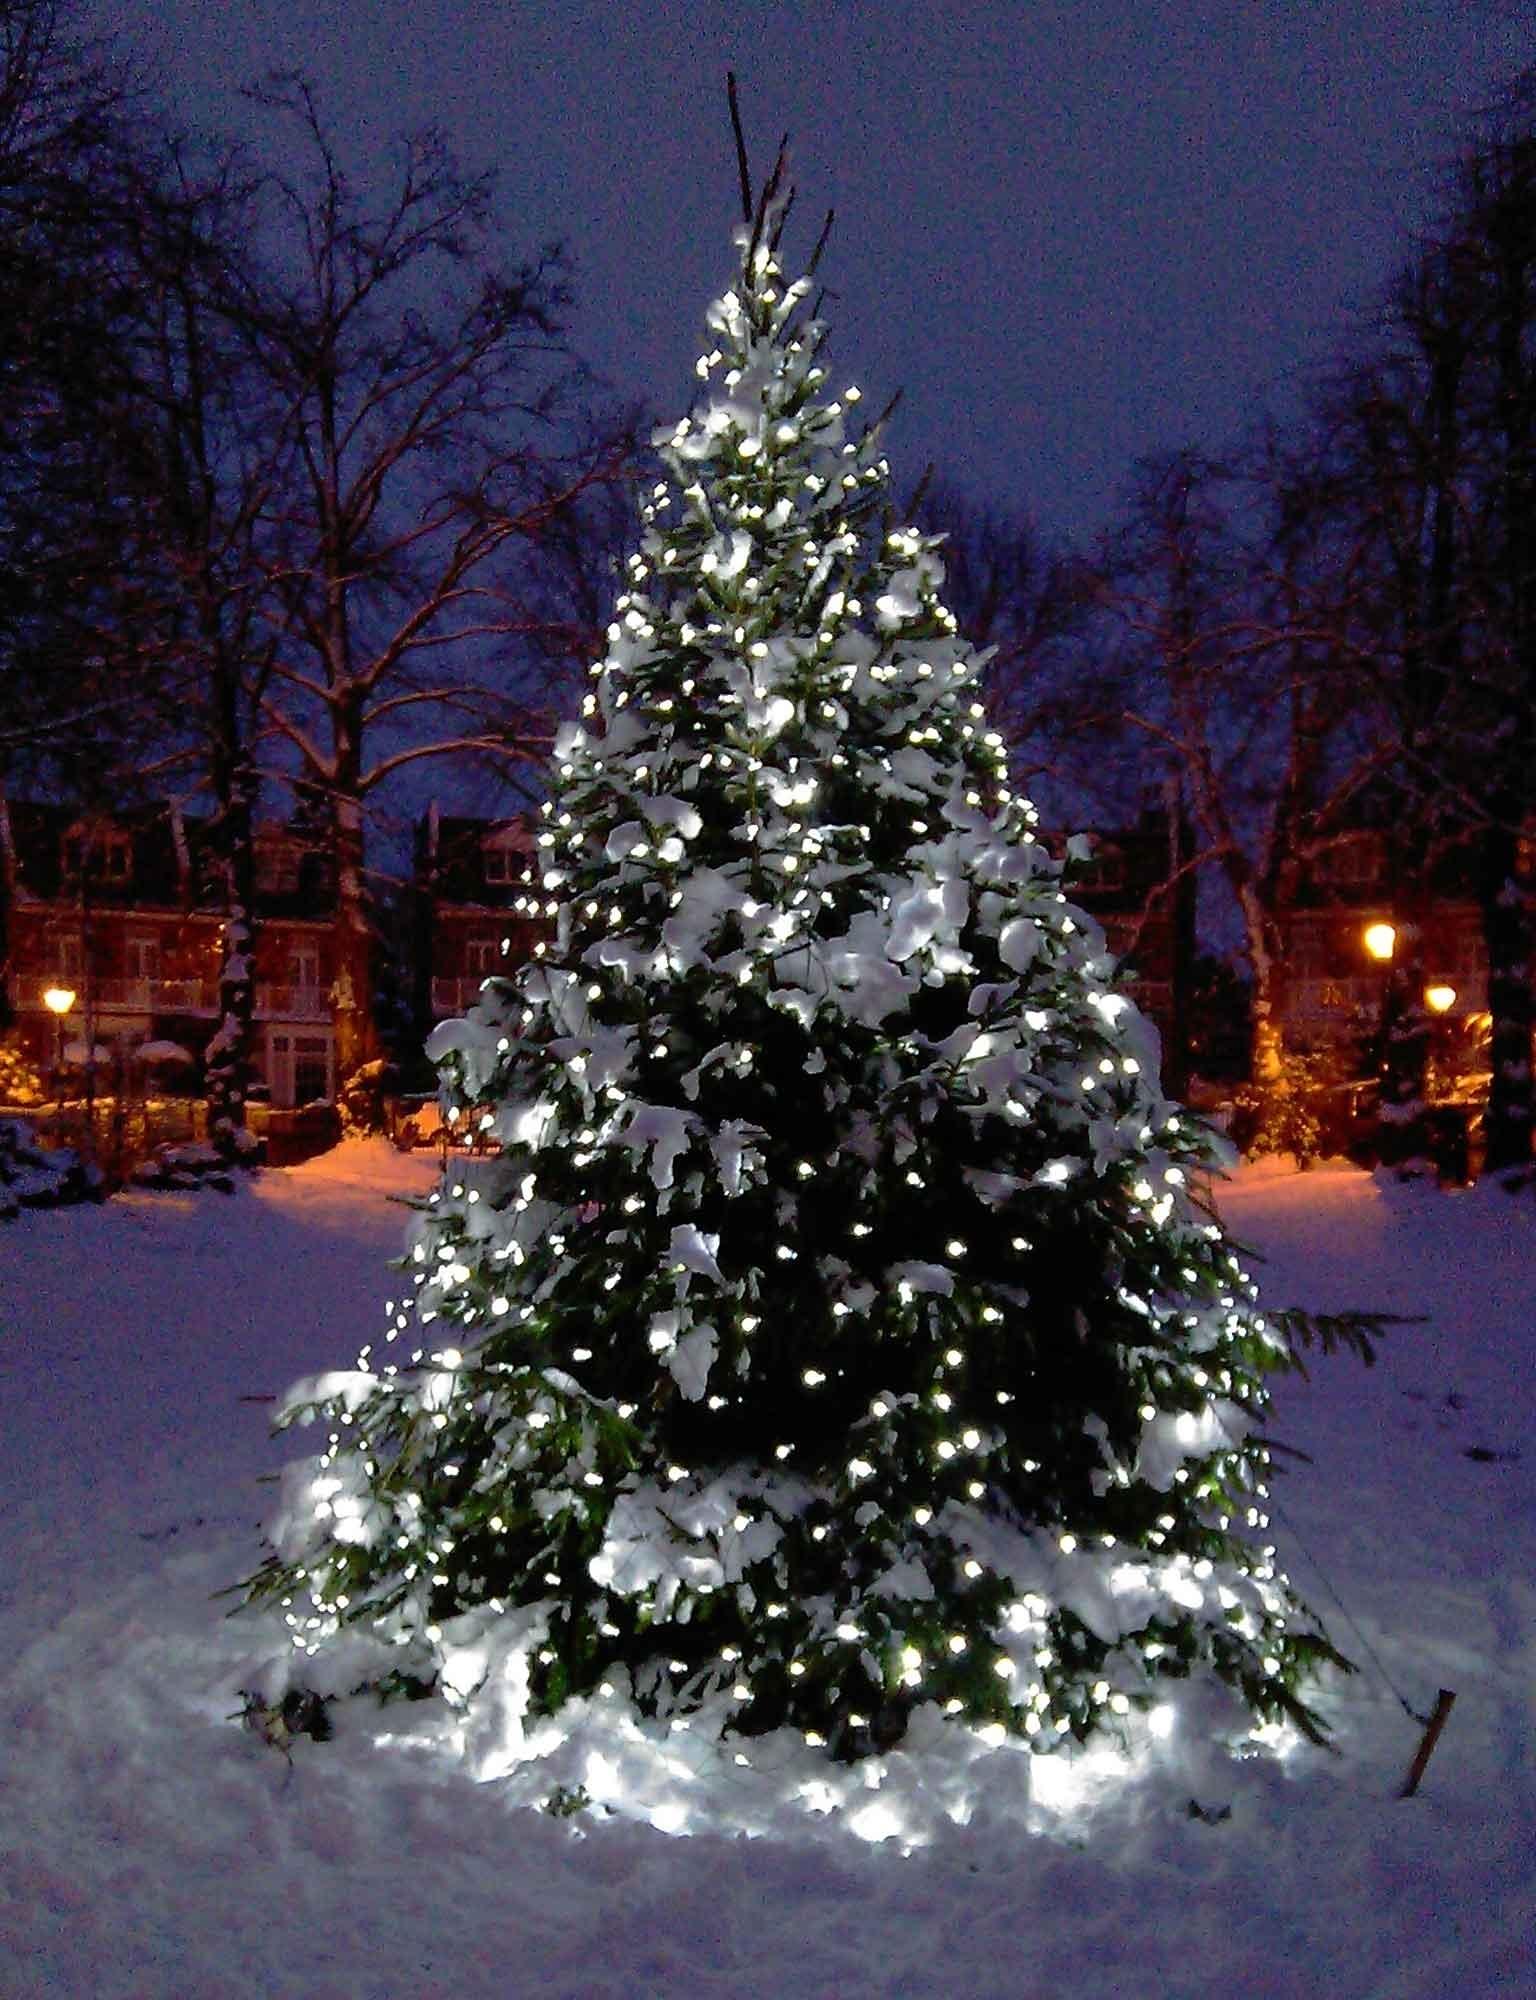 Outdoor Xmas Lanterns Regarding Most Popular Christmas Tree Light Ideas (View 6 of 20)